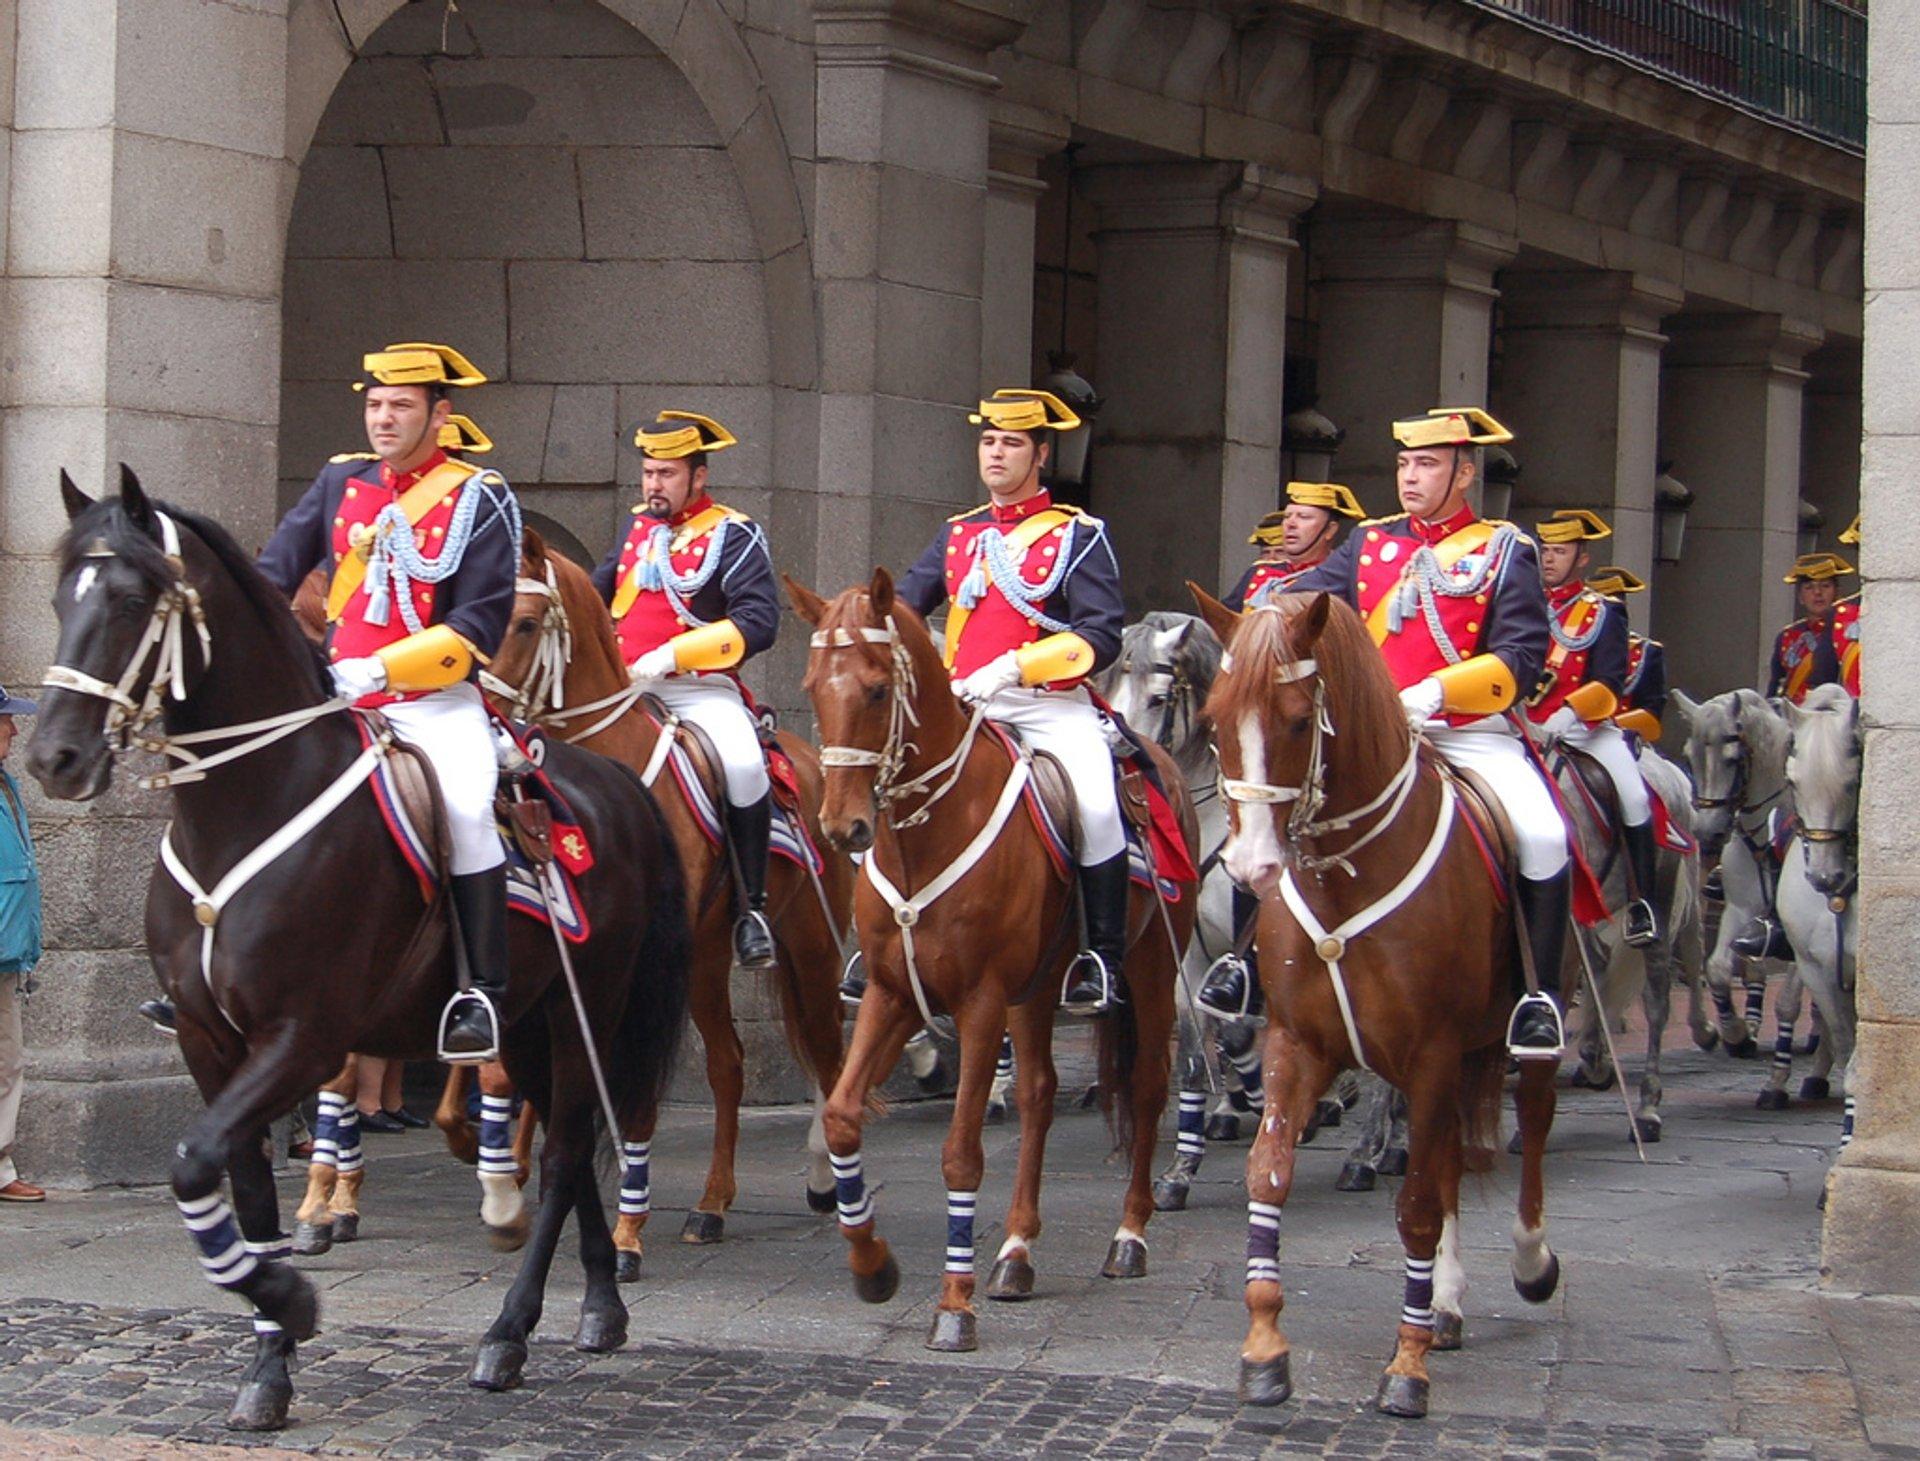 Fiesta Dos de Mayo (Day of Madrid Festival) in Madrid - Best Season 2020